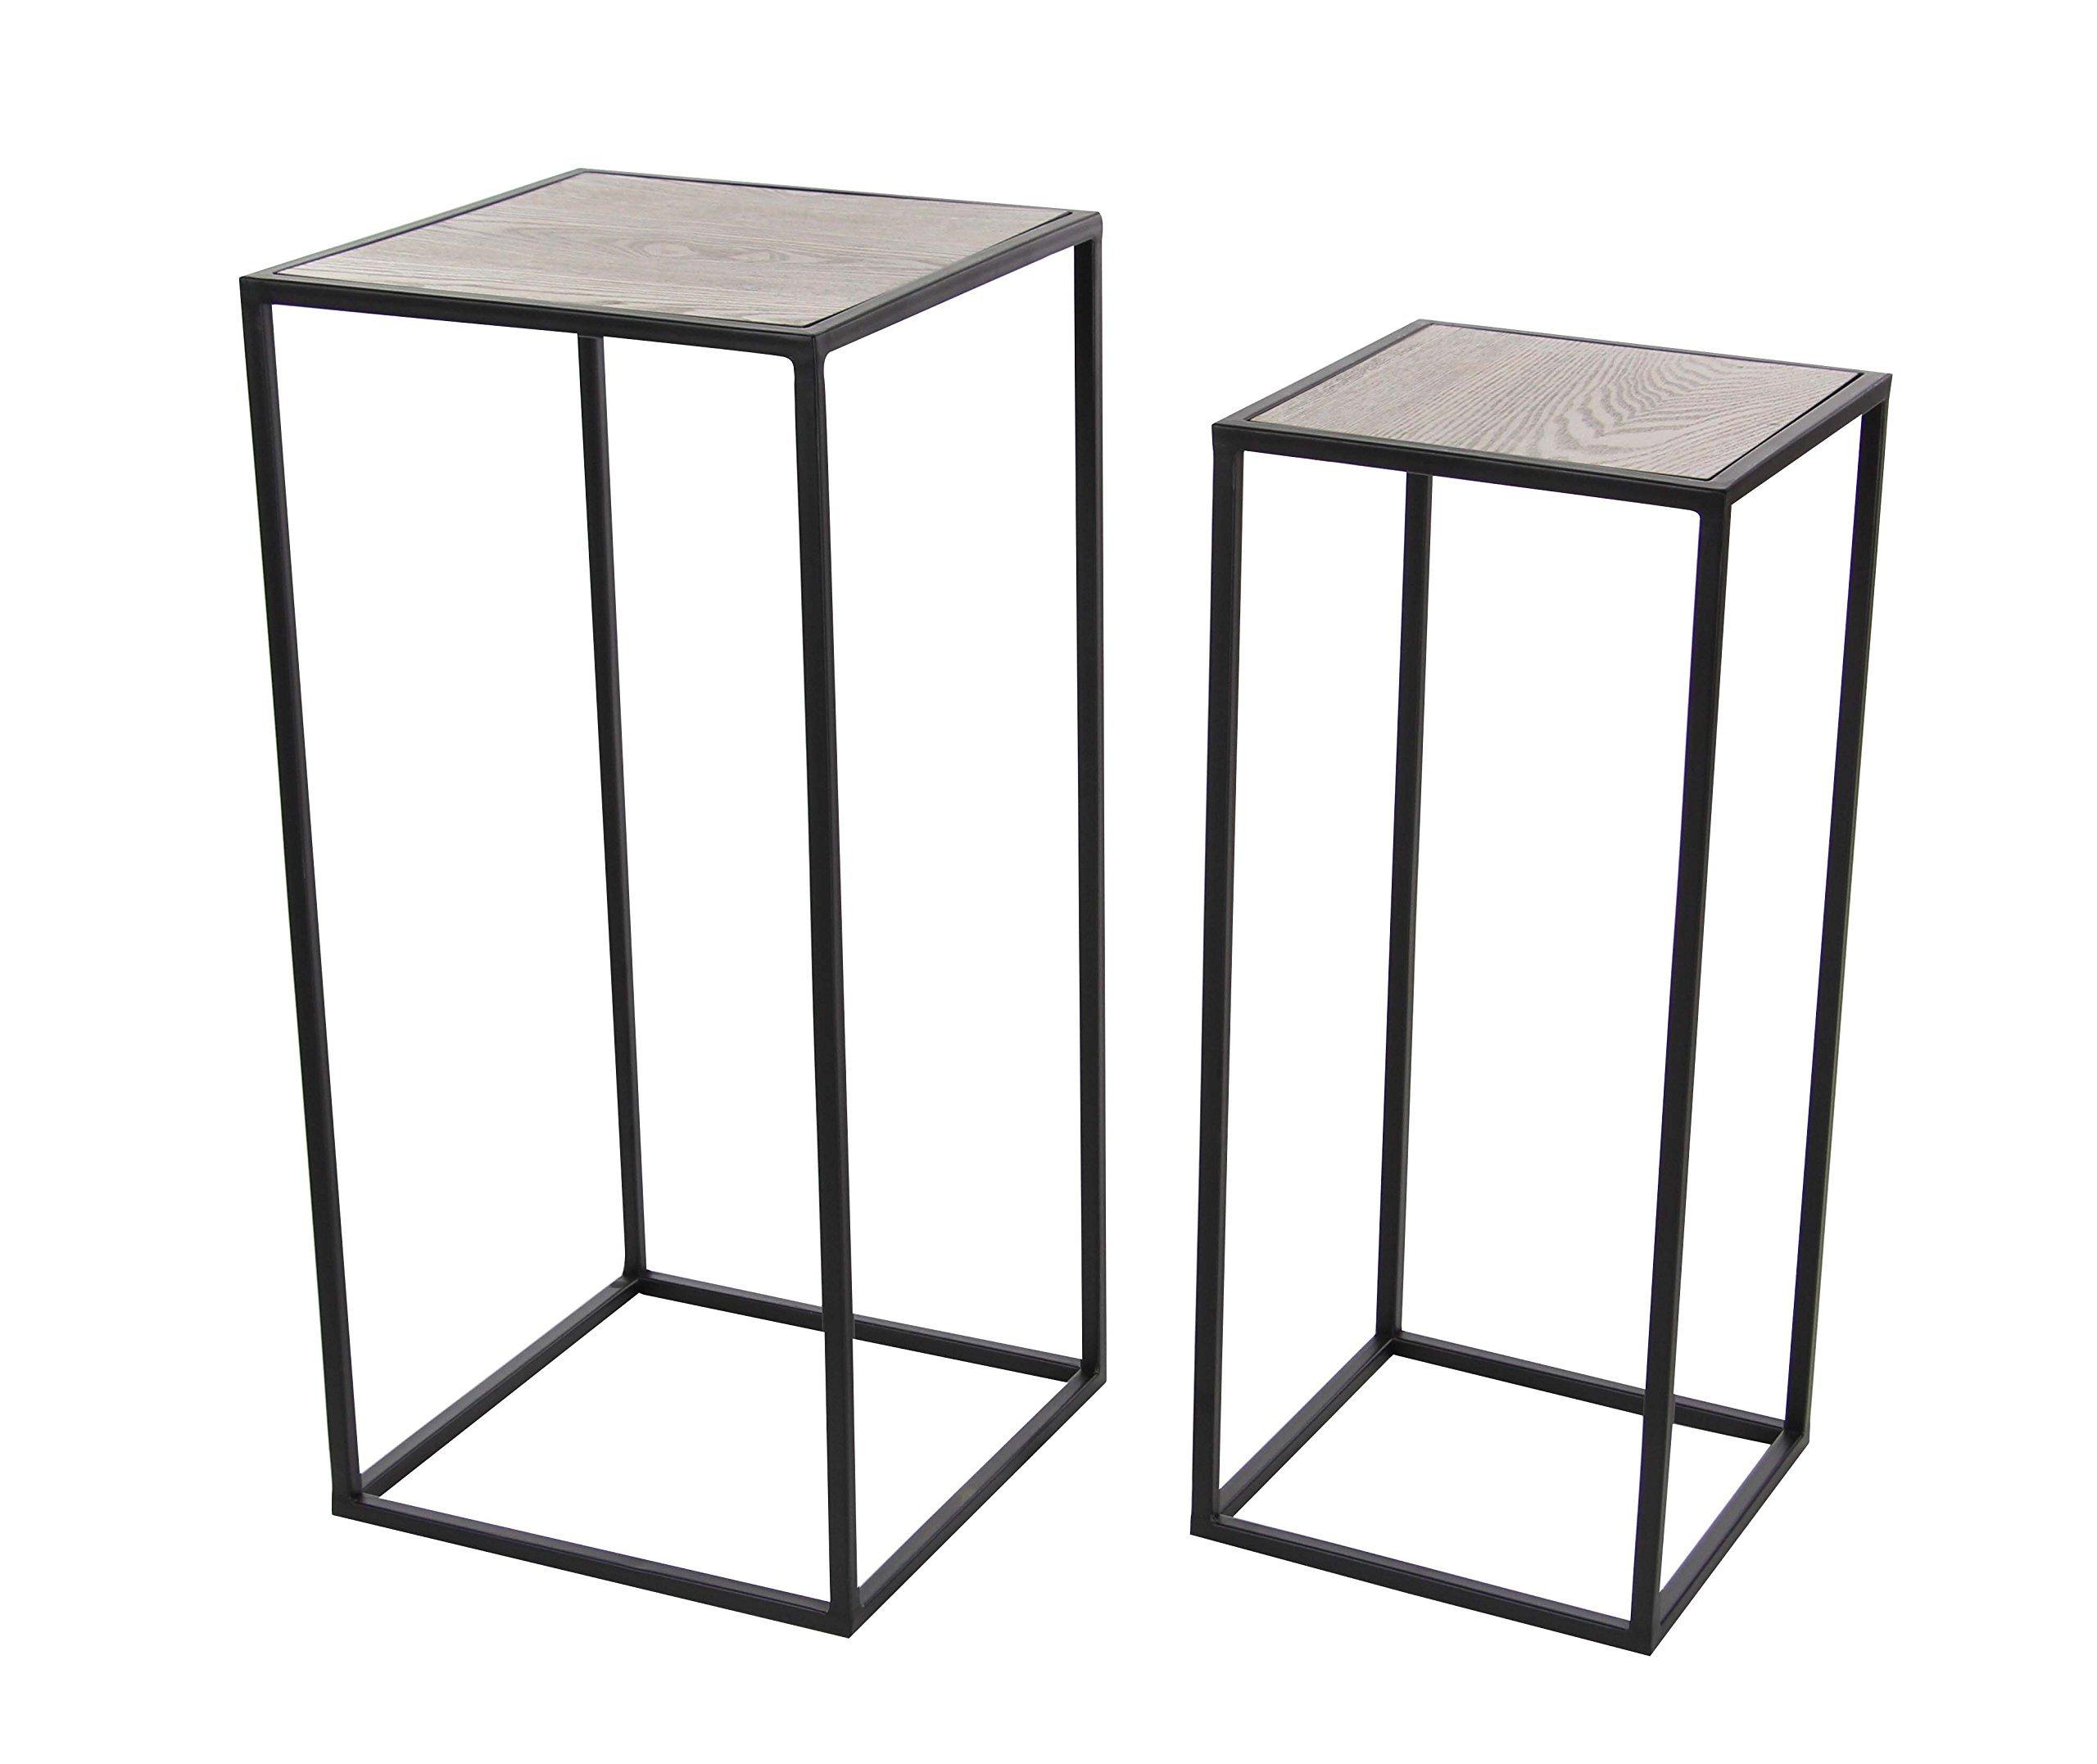 Deco 79 65624 Metal and Wood Square Pedestal Set of 2, 25'' x 28''